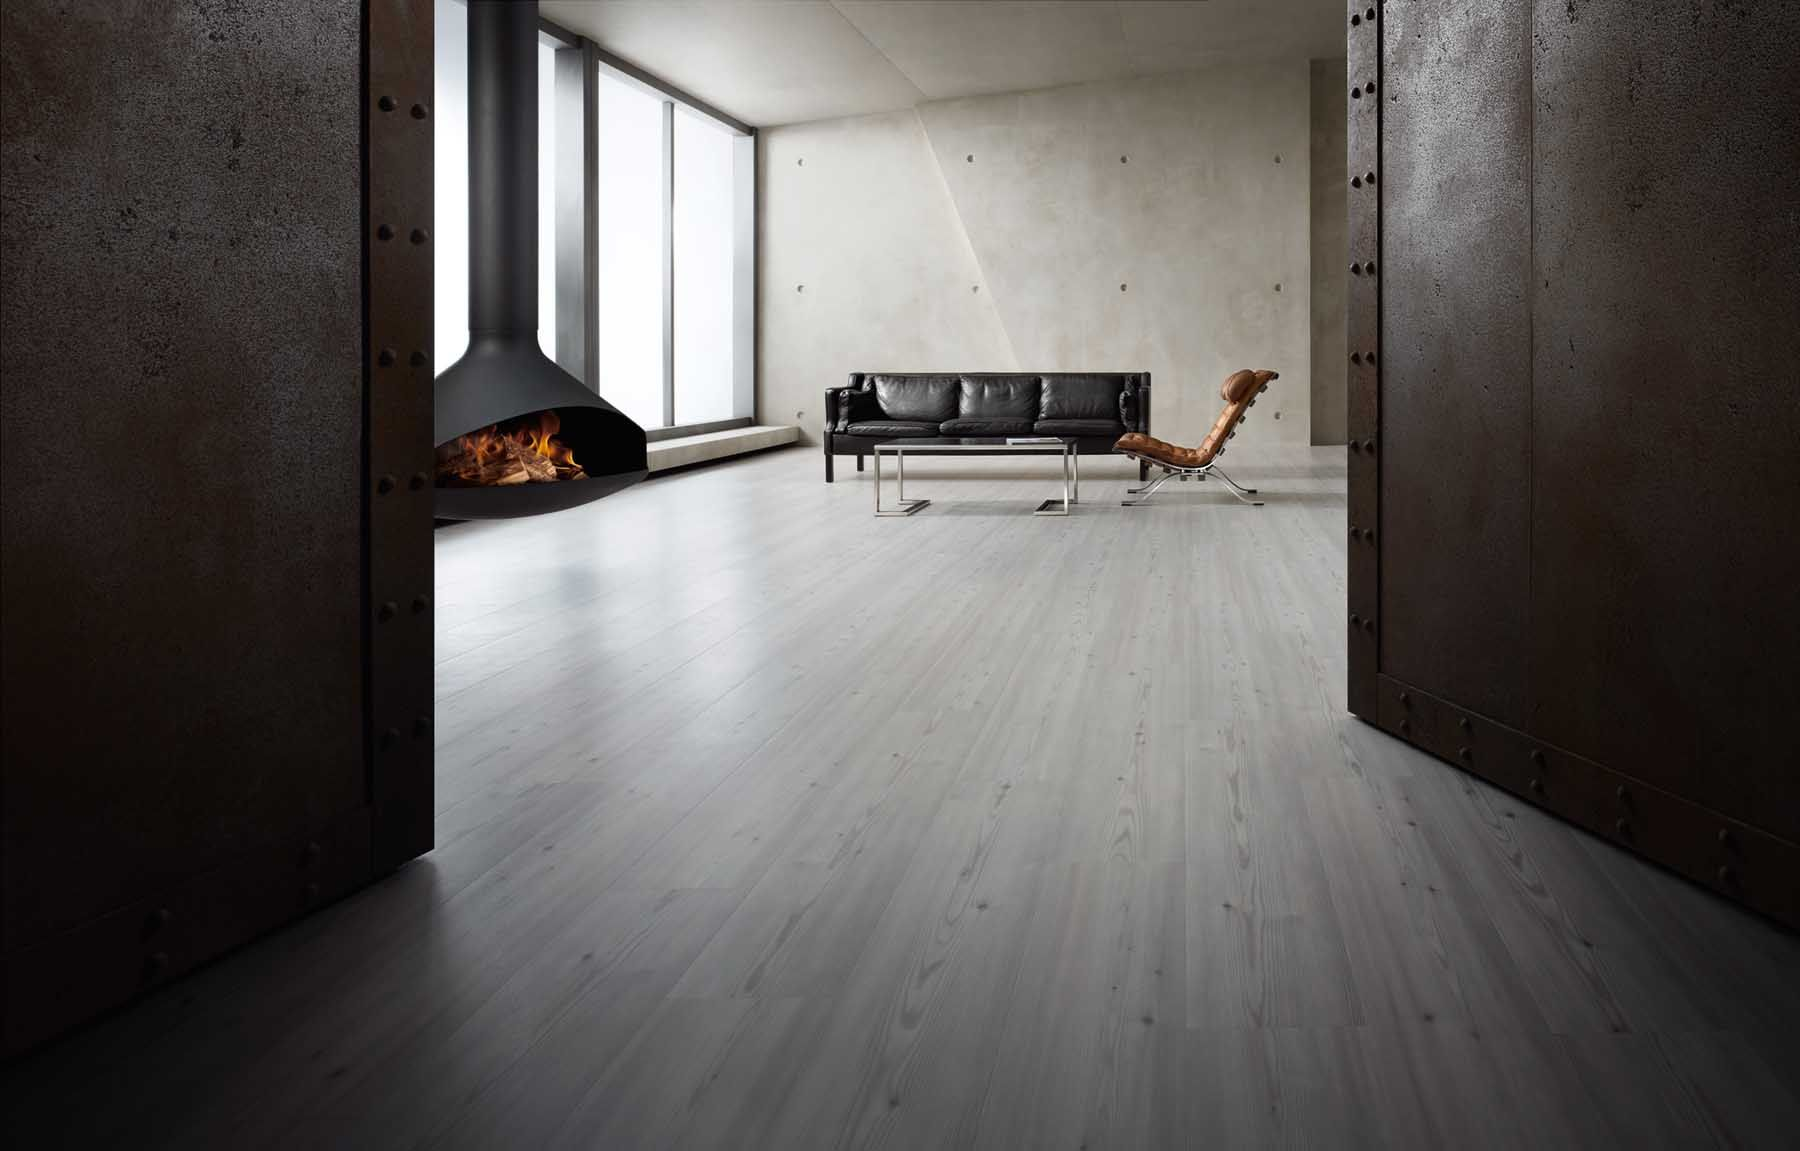 tiles stylish floor design ideas images tile fashionable flooring modern home floors